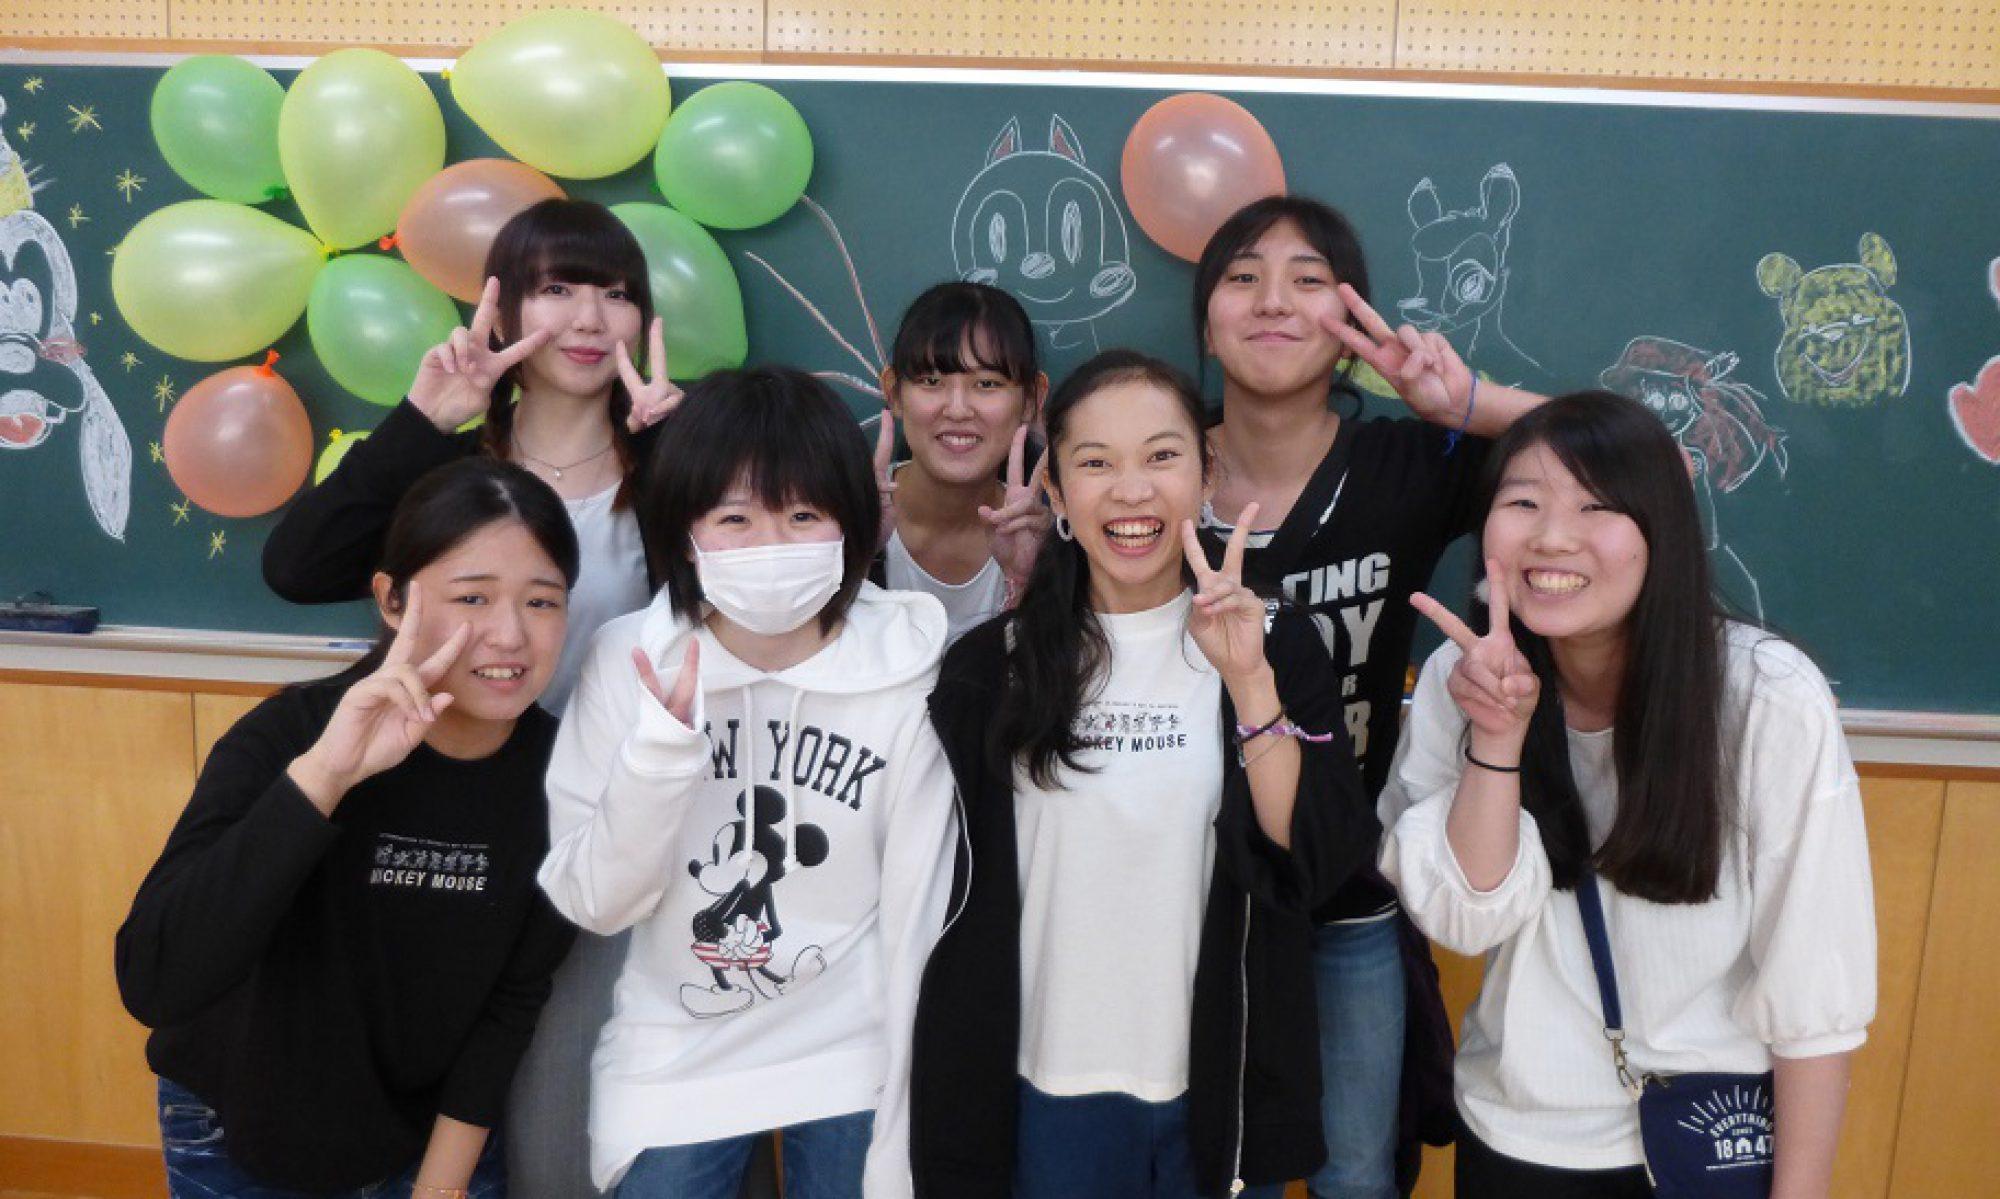 柏木実業専門学校 公式ブログ